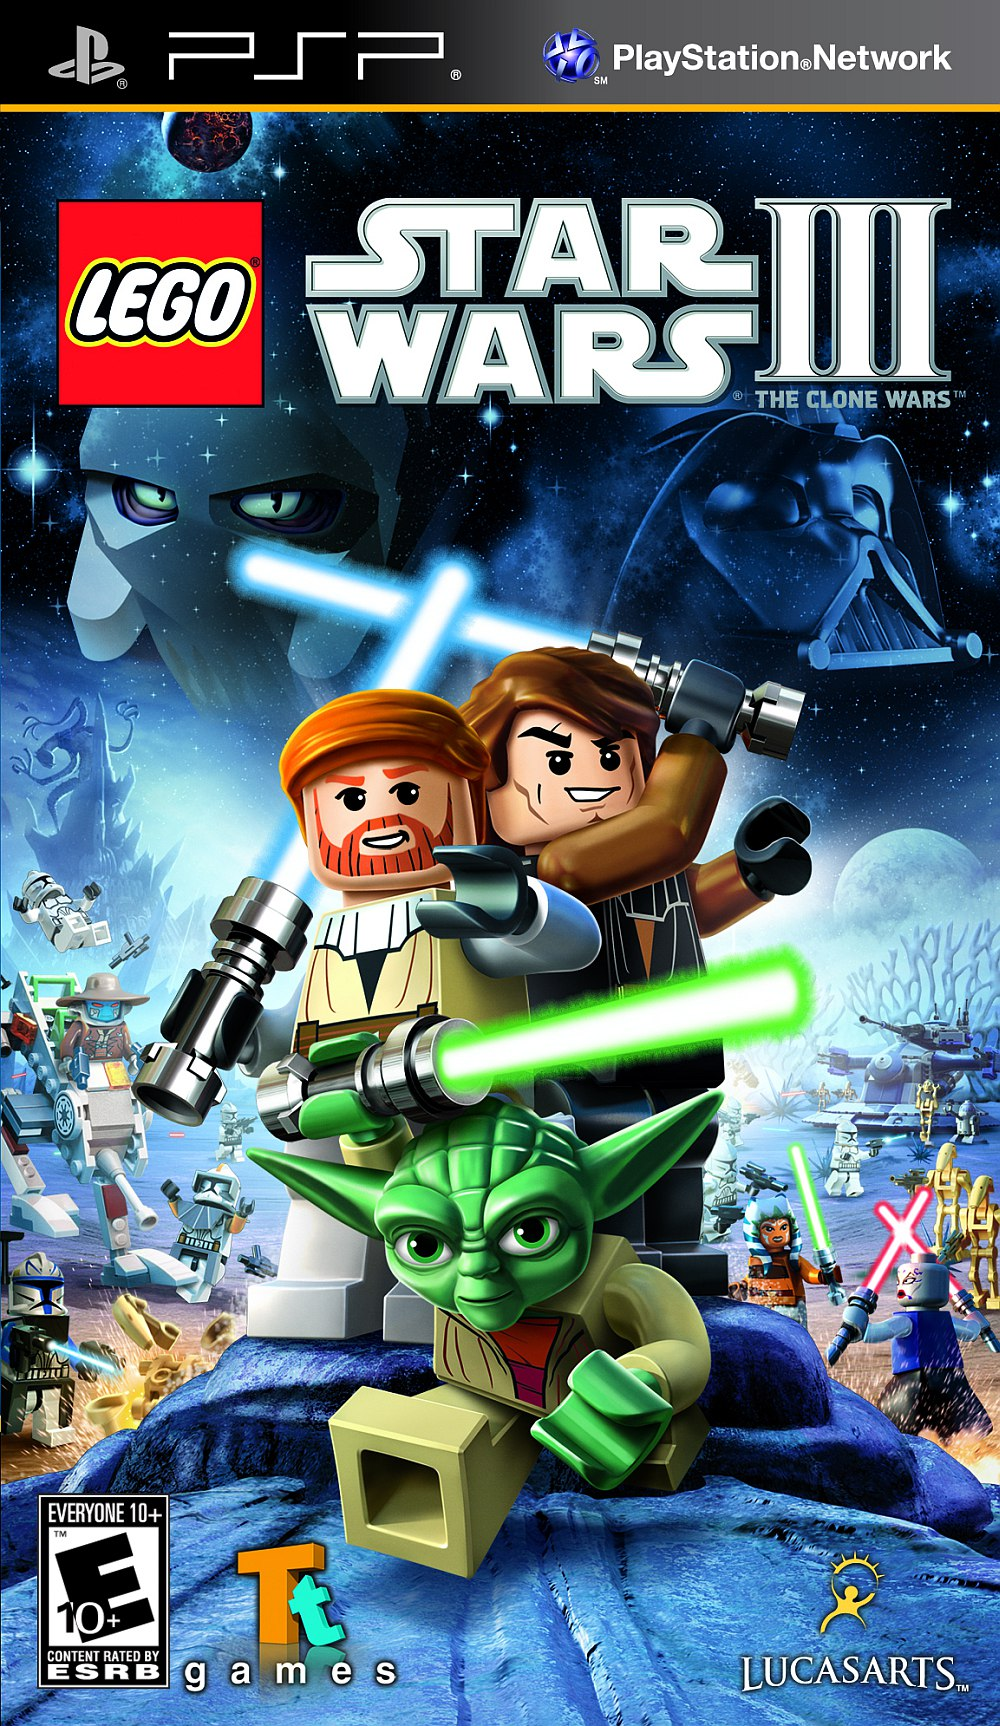 [PSP]LEGO Star Wars III: The Clone Wars